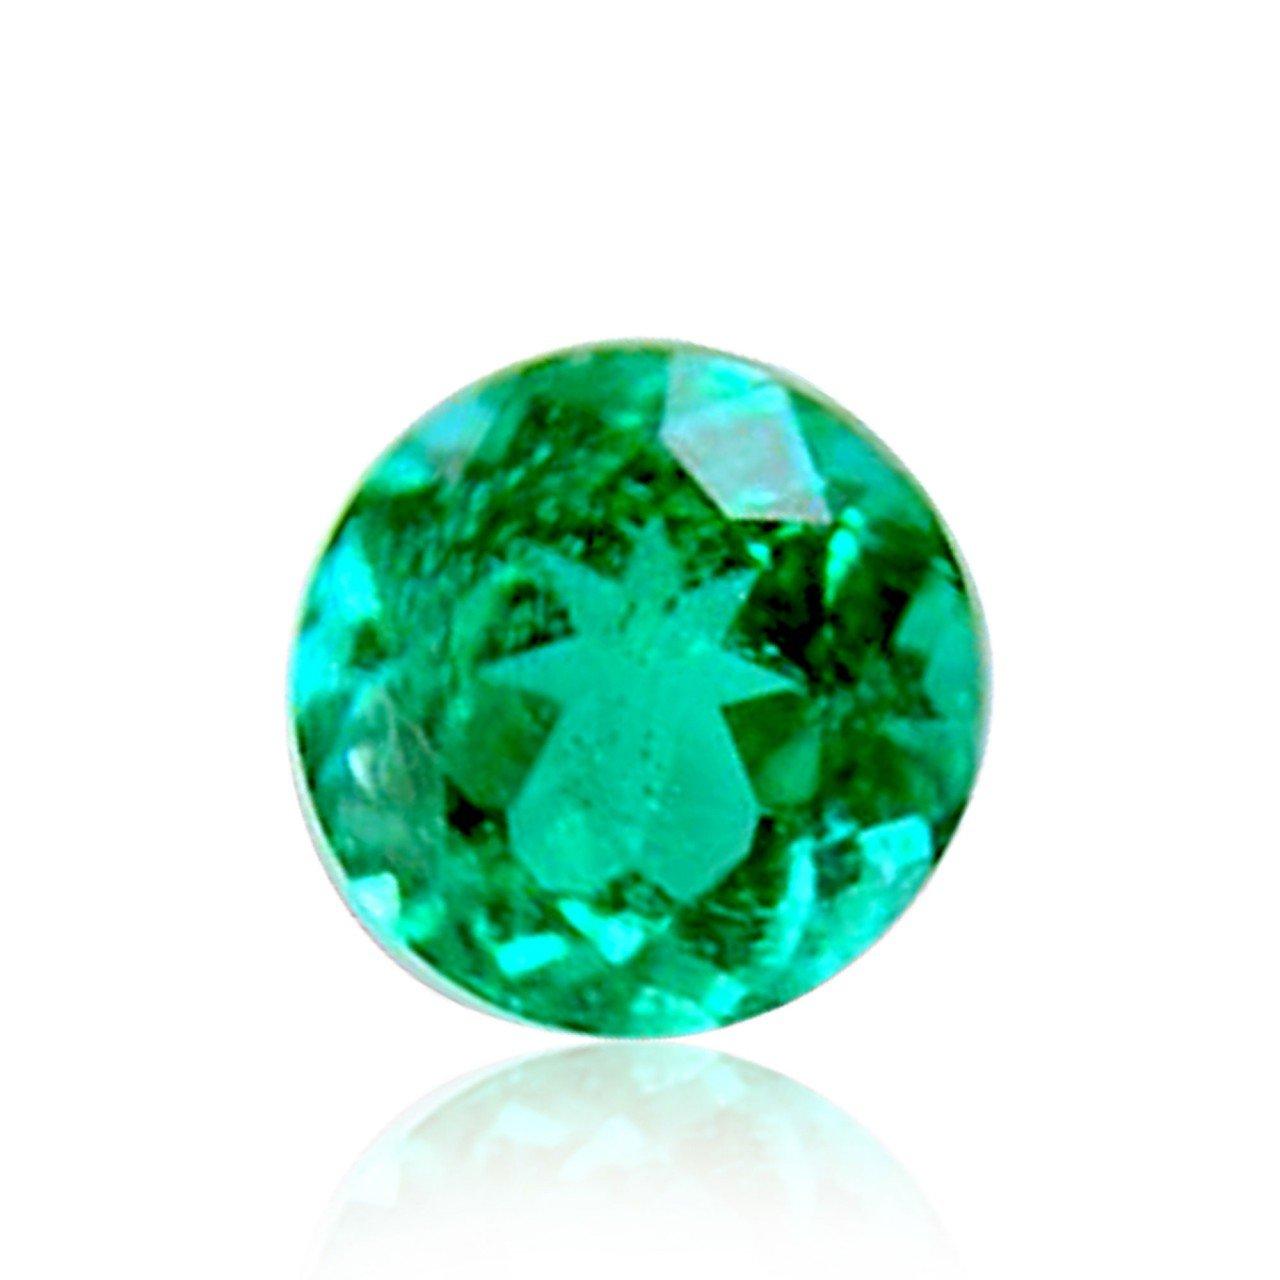 0.17 Carat Vivid Green Emerald Loose Gemstone Round Cut